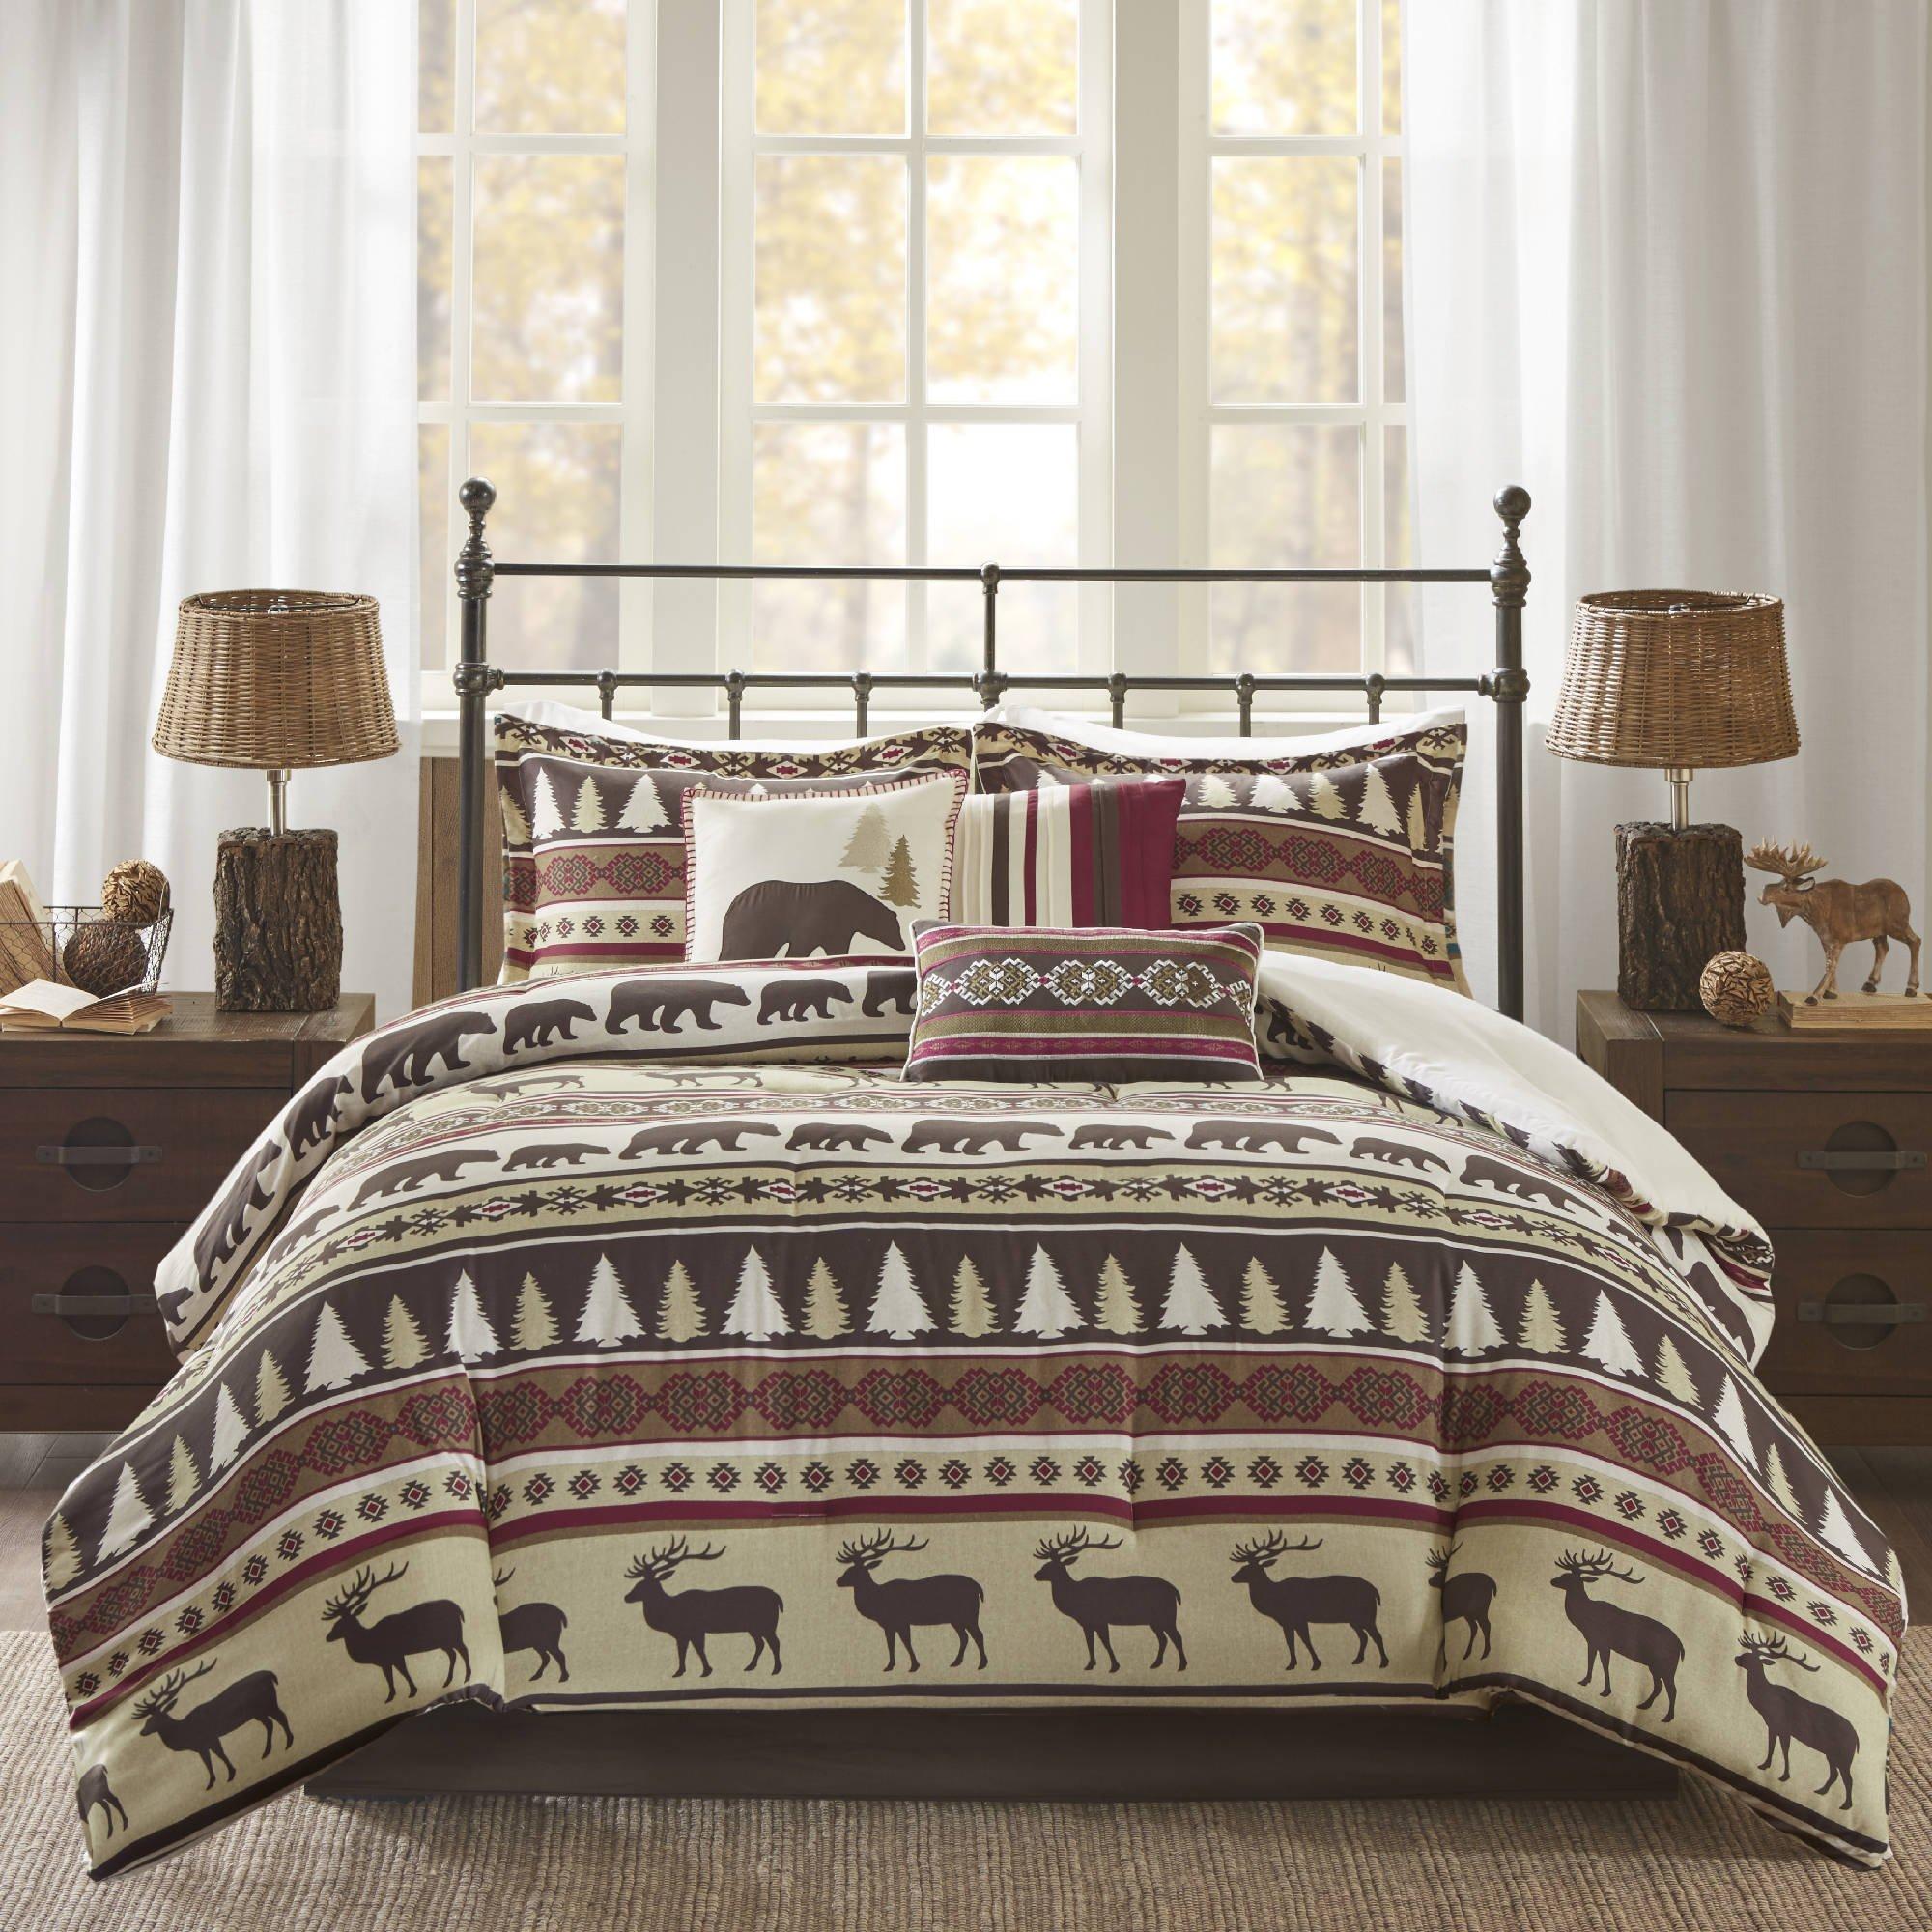 7 Piece Brown Red Cabin Lodge Stripes Pattern Comforter King Set, Beautiful Pine Trees, Bears, Elk Deer, Hunting Animal Stripe-Inspired Nature Motif Design, Soft & Comfy Bedding, Polyester, Unisex by AD (Image #1)